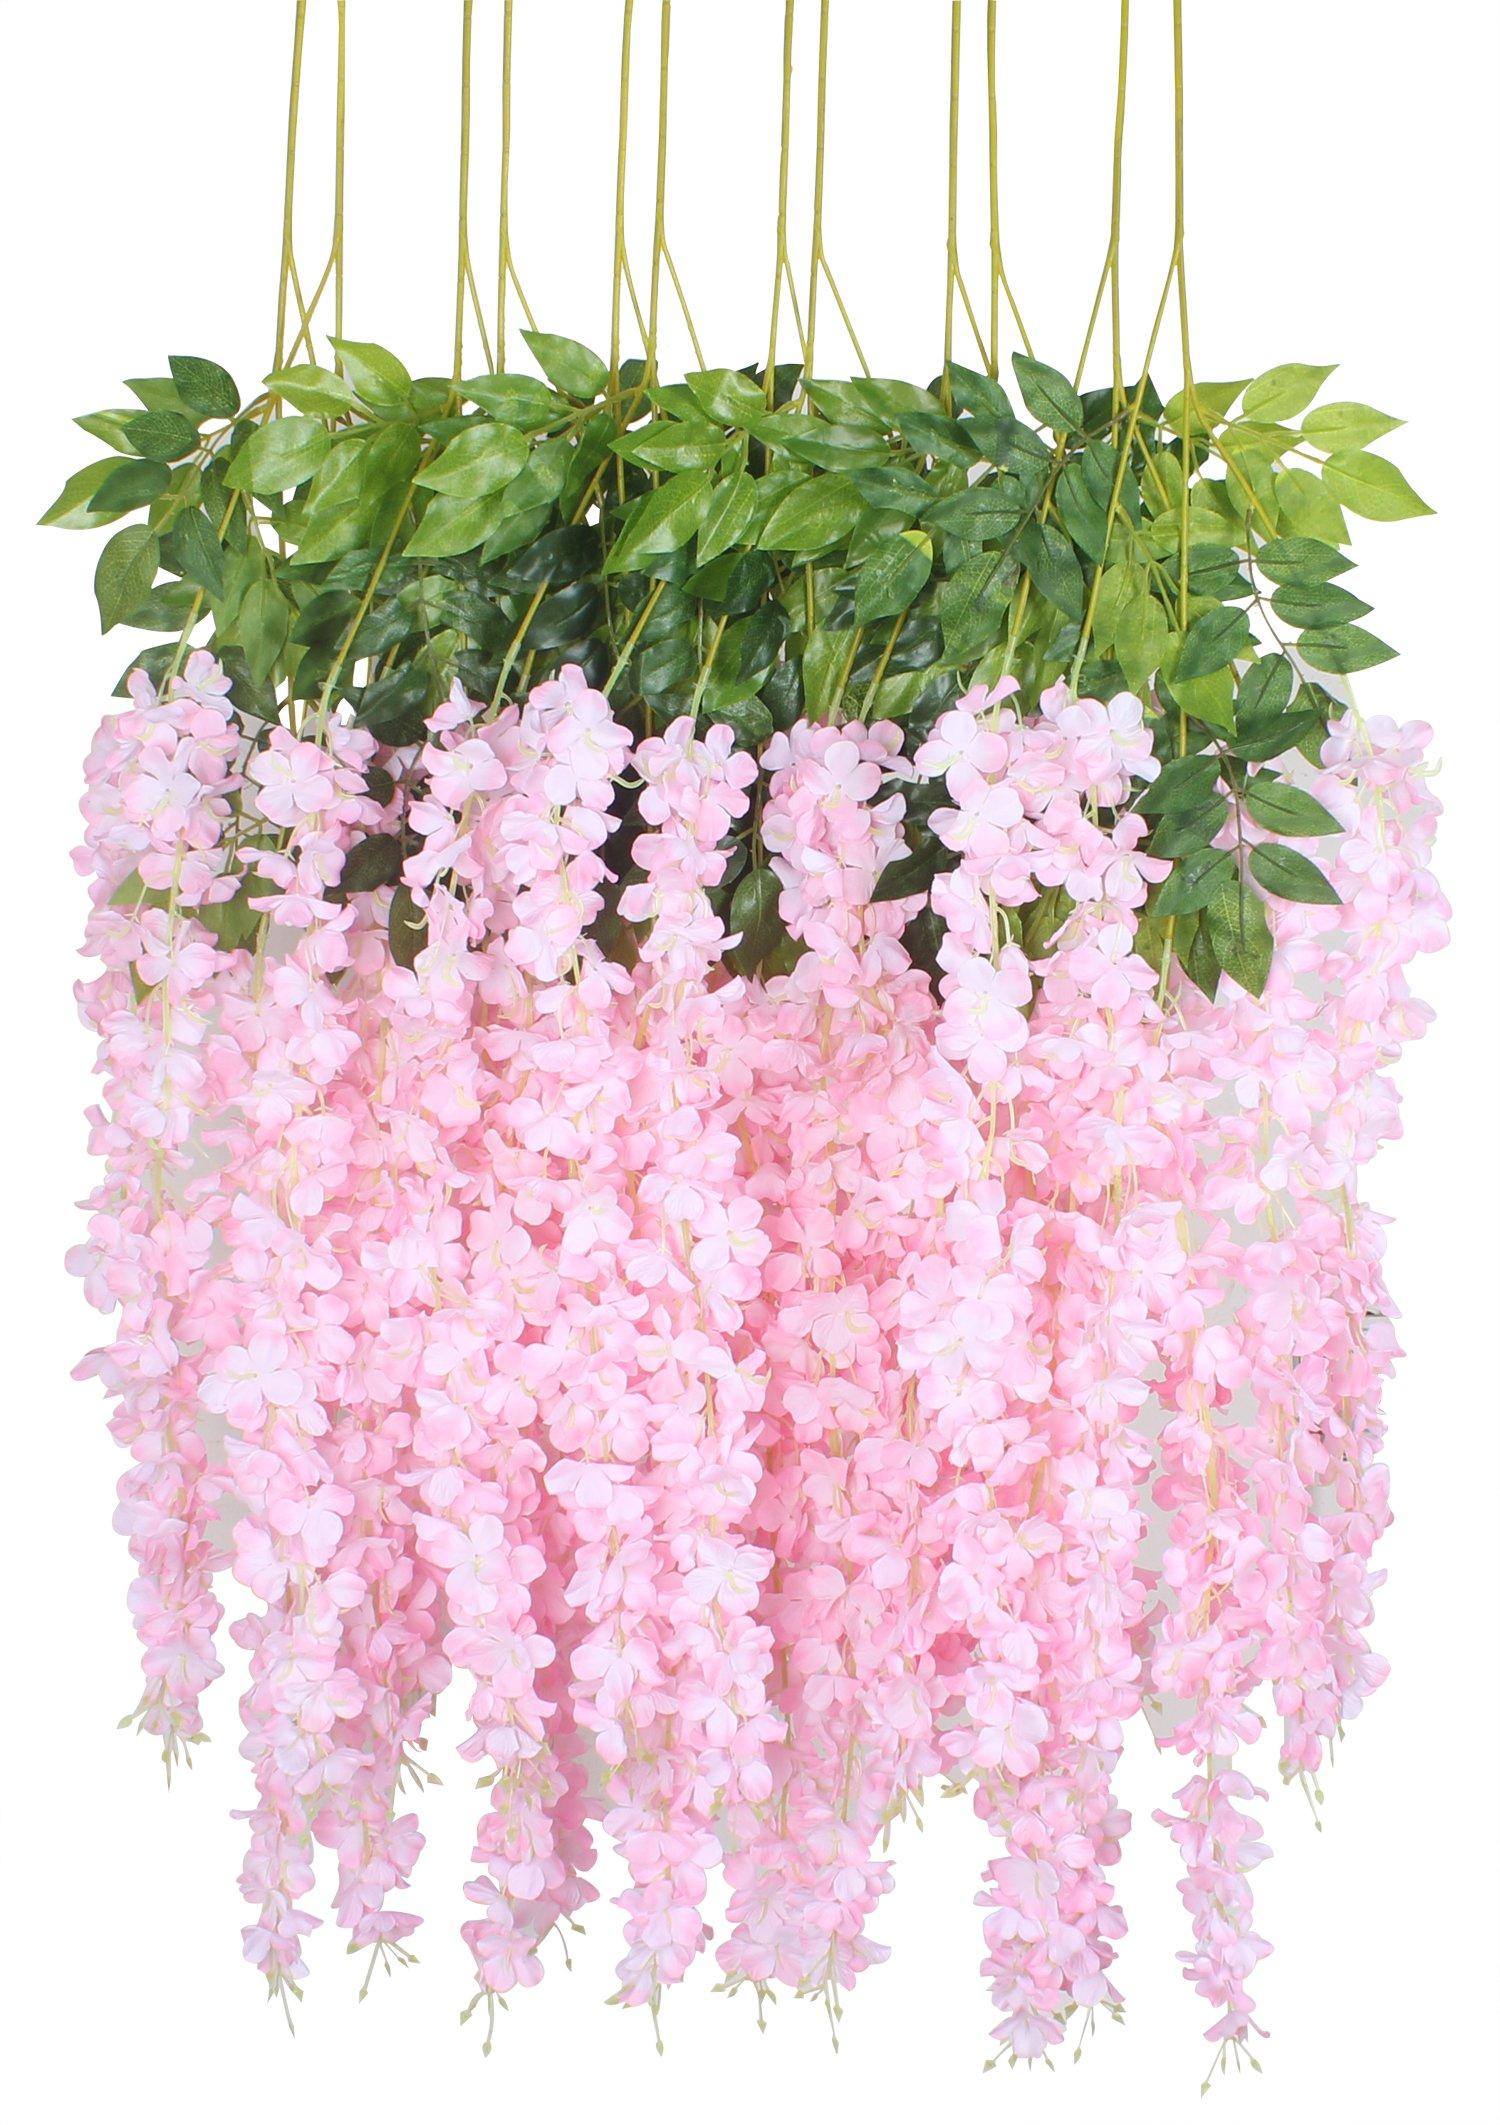 silk flower arrangements duovlo 12 piece artificial silk wisteria vine 3.6 feet ratta hanging flower garland string home party wedding decor (light pink)